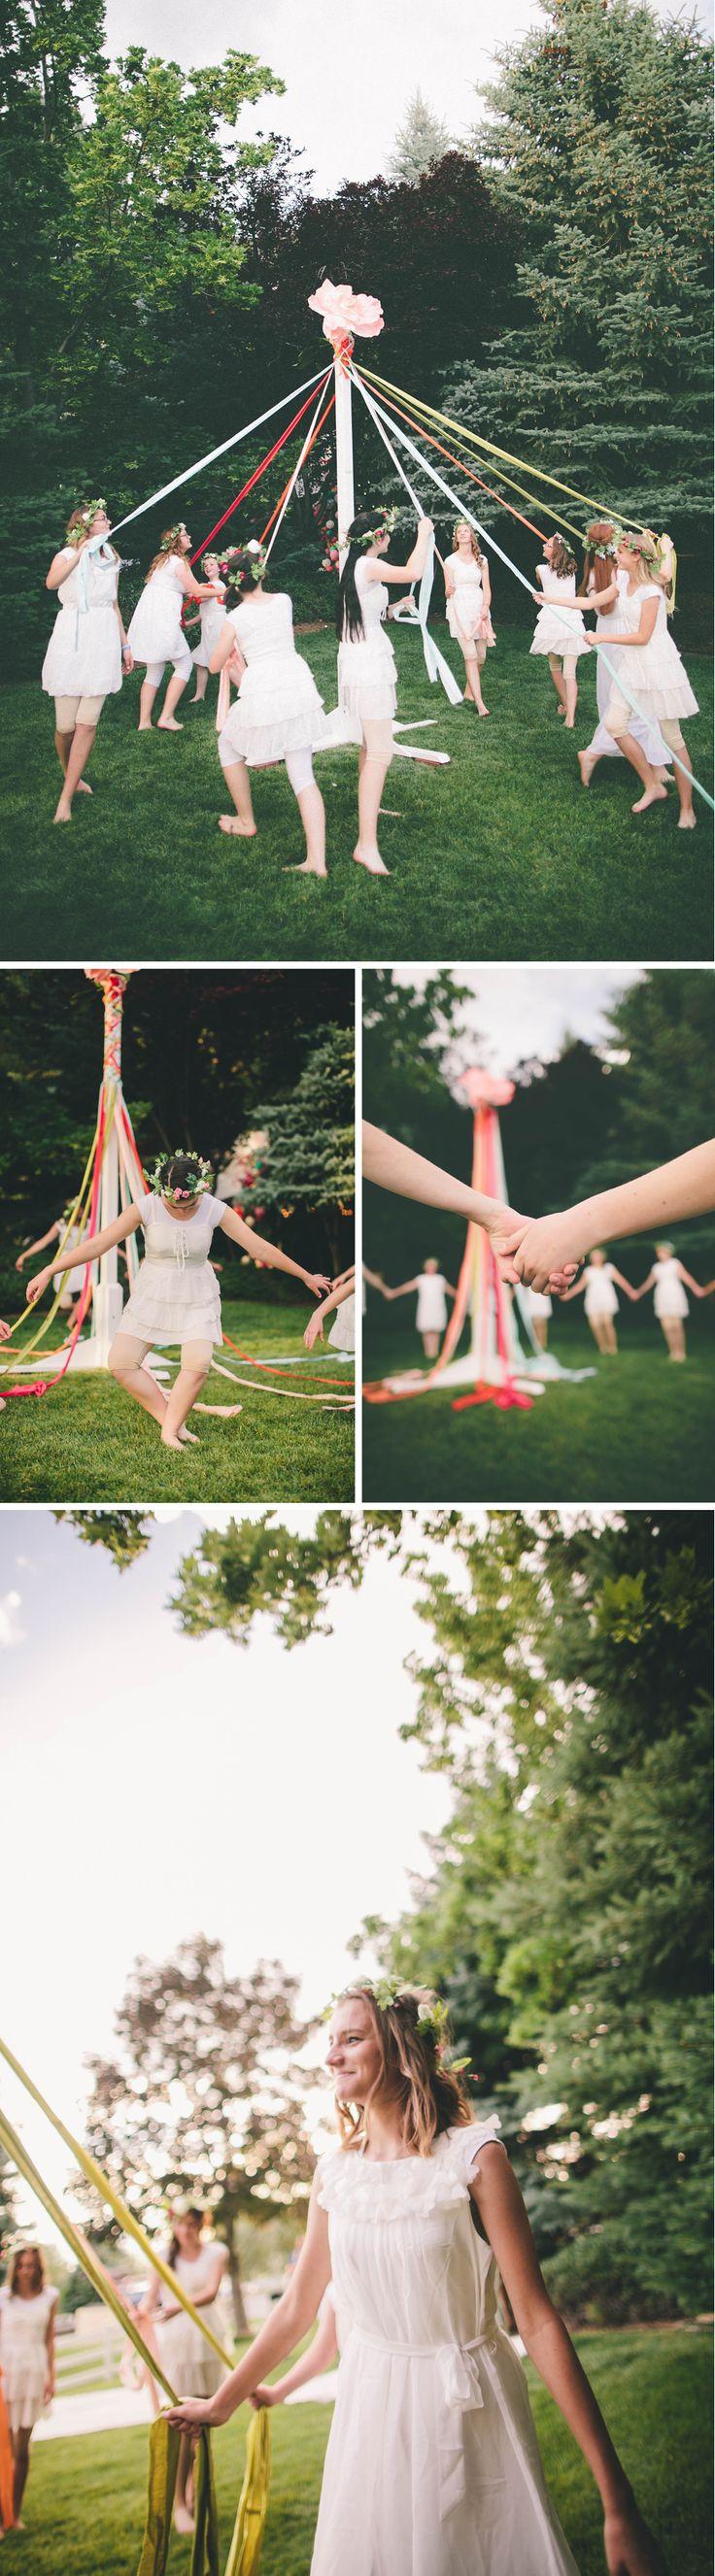 A Midsummer Mingle: The maypole dance